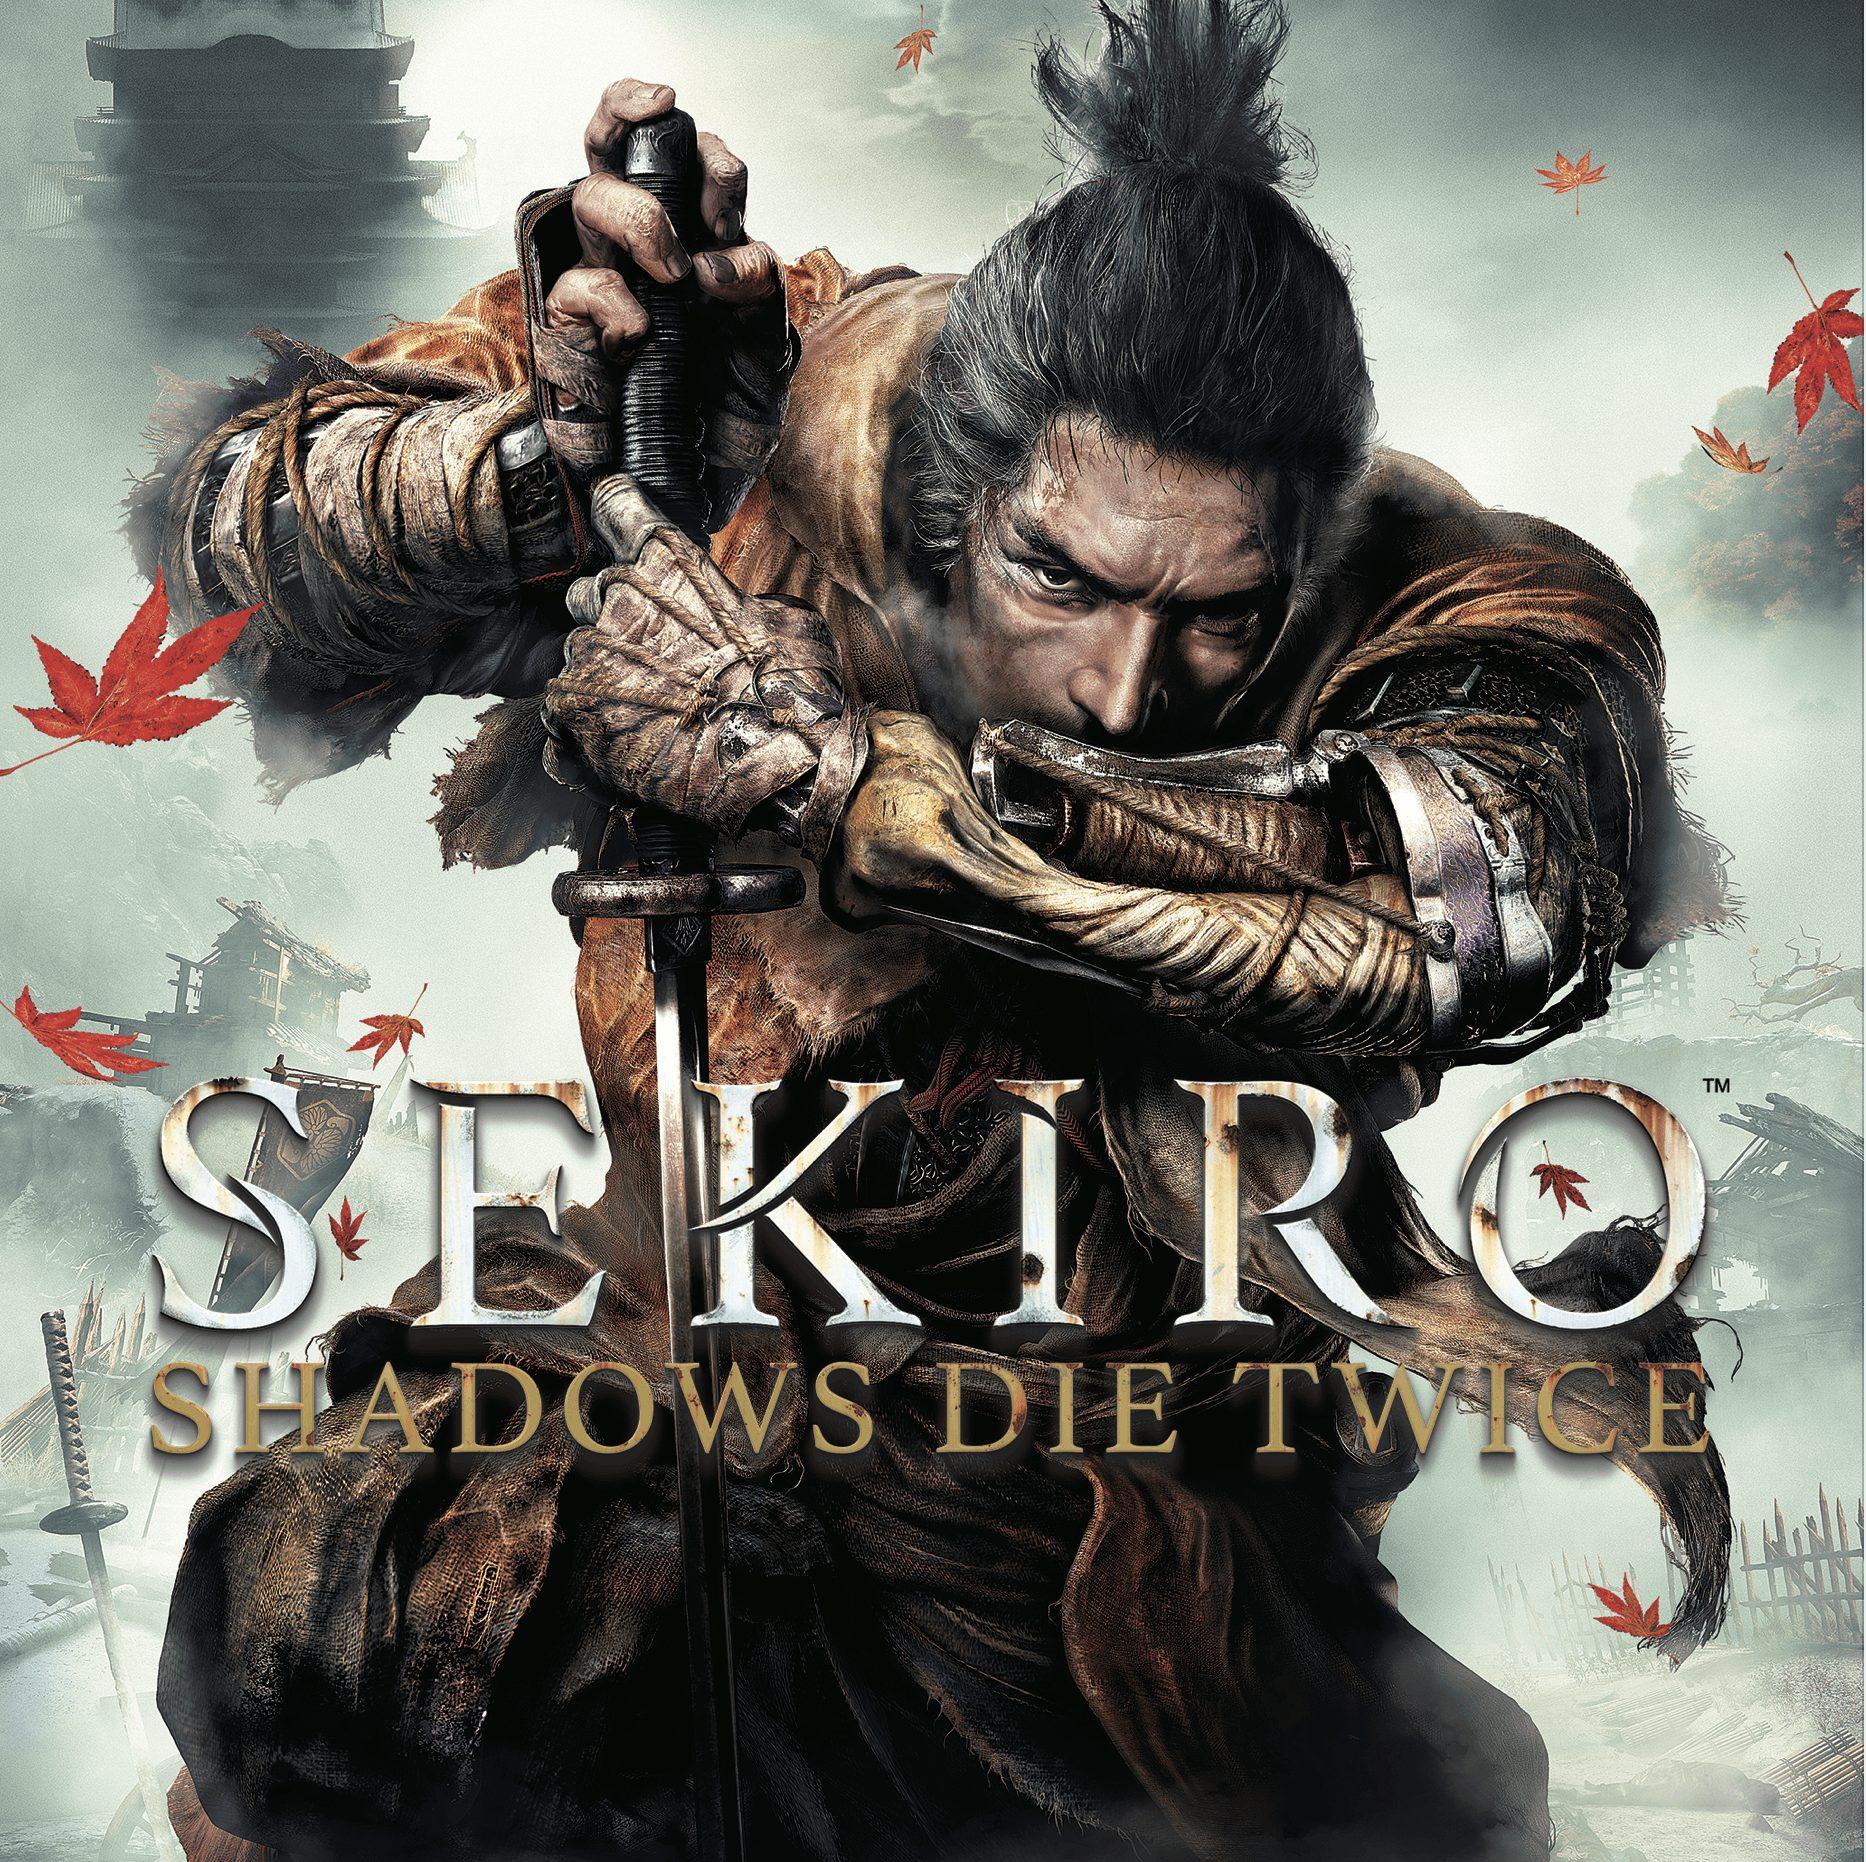 ENT-05_SEKIRO-SHADOWS_DIE_TWICE_BG000142